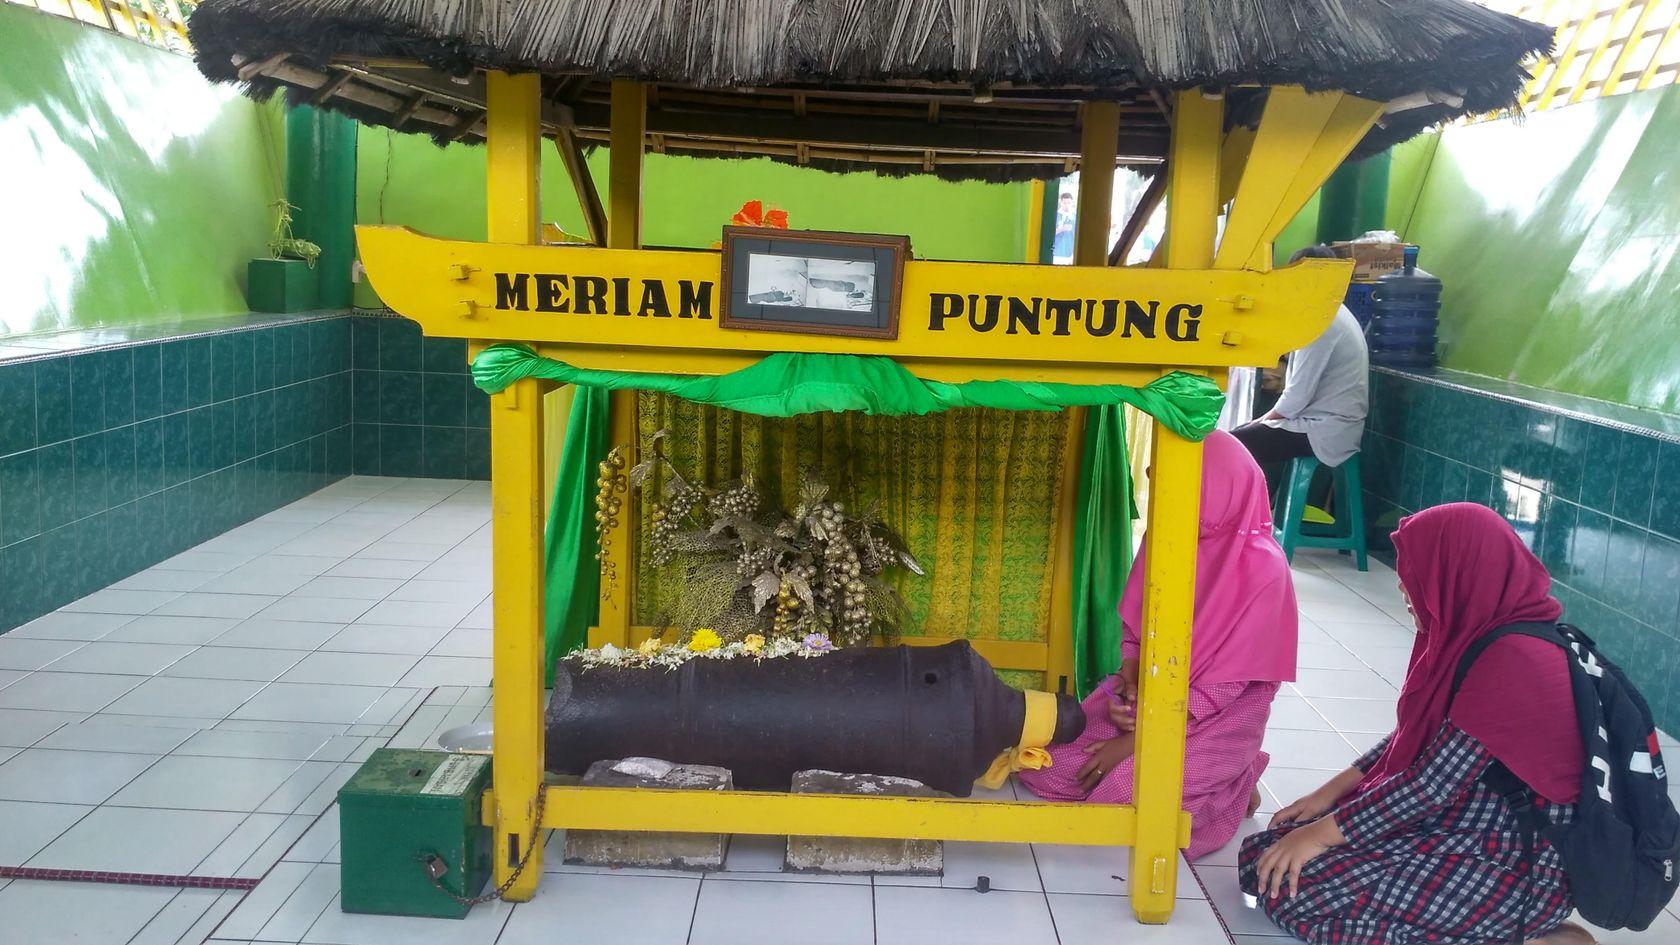 Kisah Meriam Puntung Puteri Hijau Kerajaan Aceh Steemit Cukup Melegenda